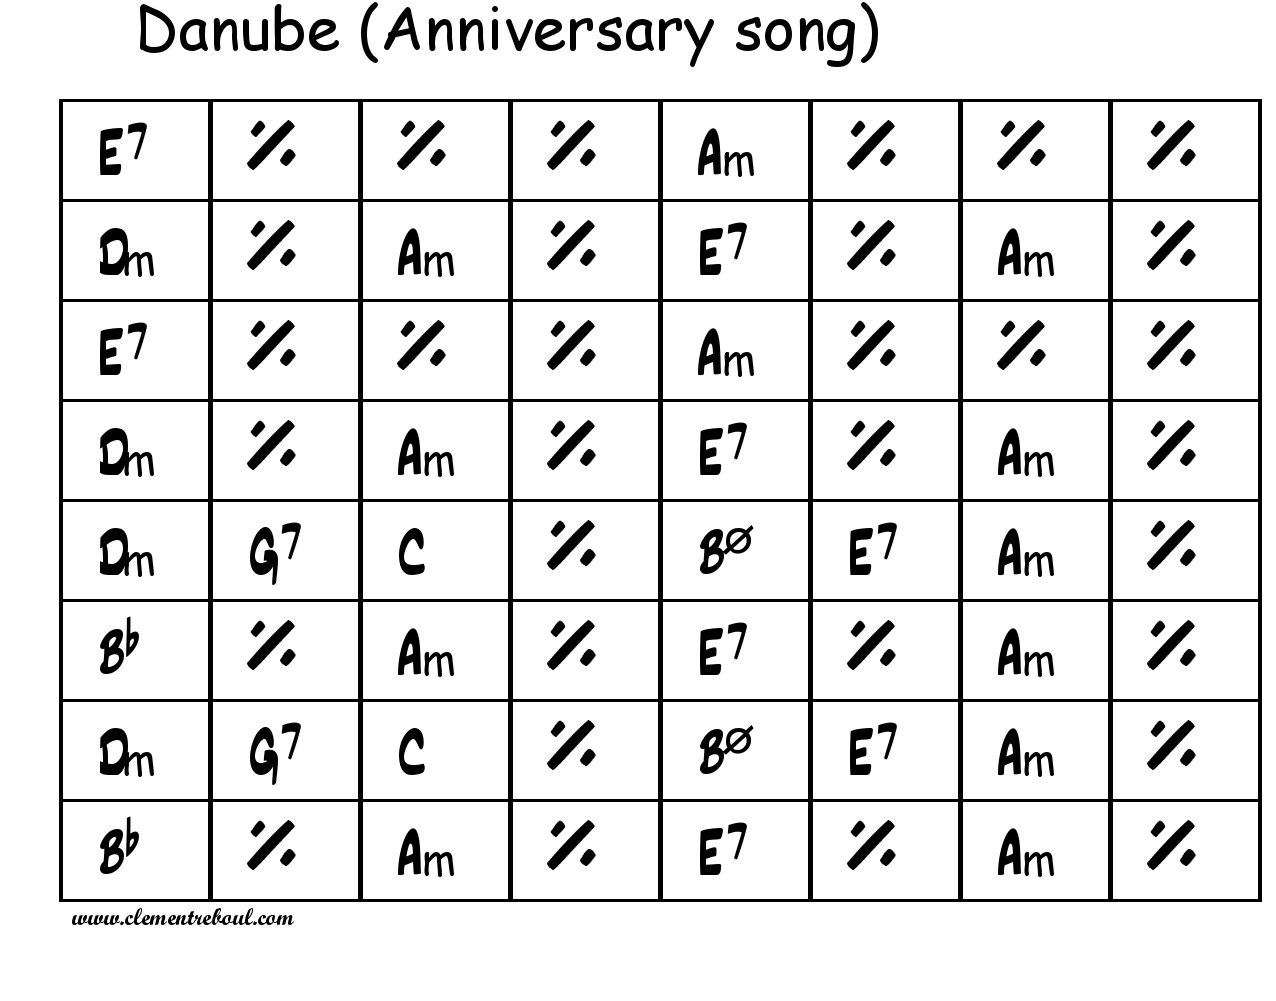 danube-anniversary-song-apprendre-le-jazz-manouche